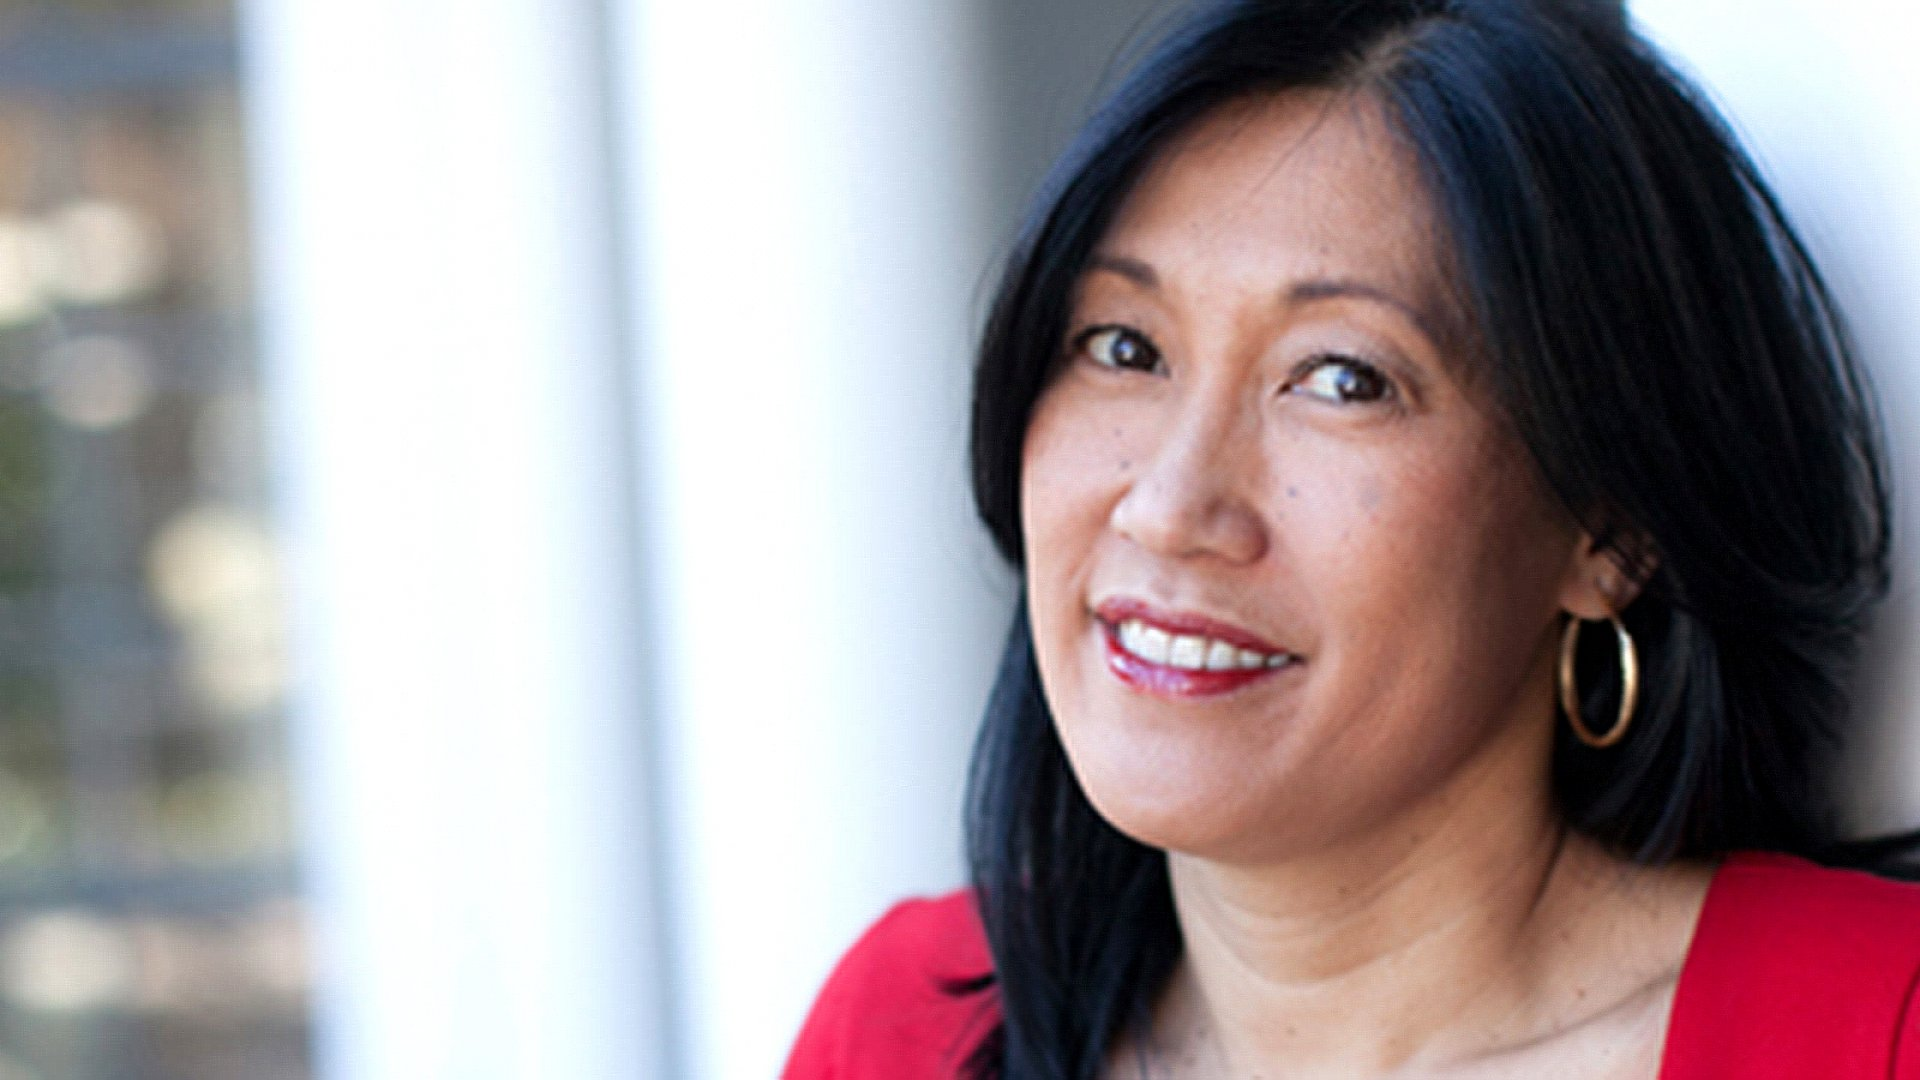 A Top Venture Investor Busts Myths About Women Entrepreneurs